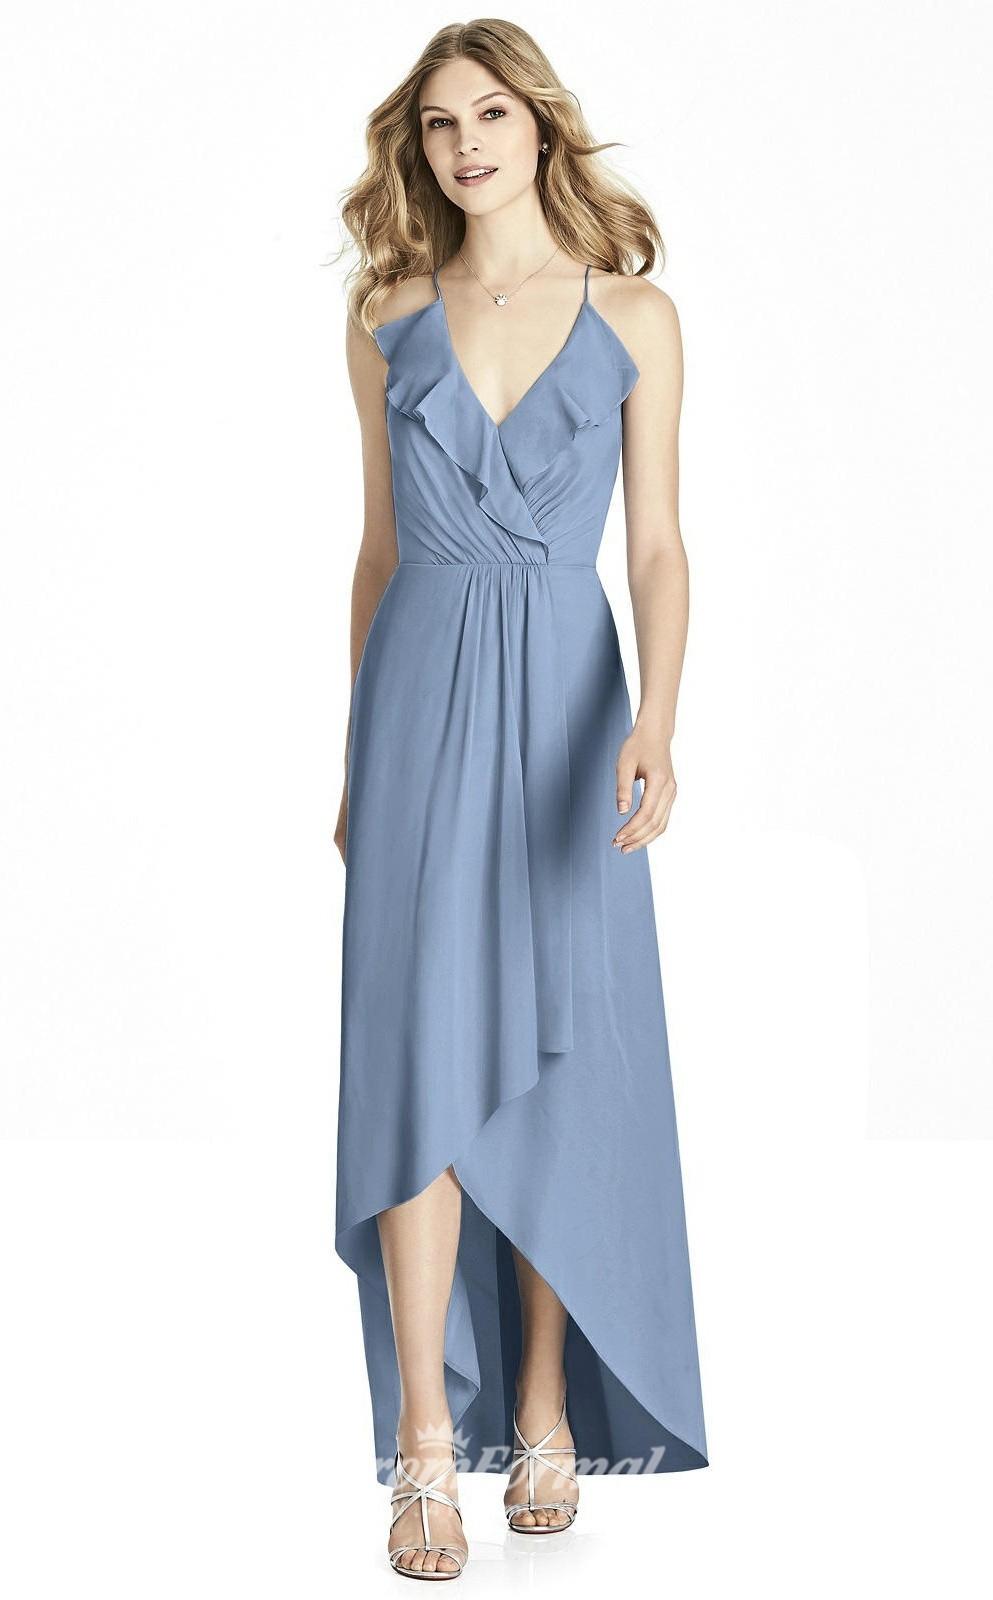 8d69b856f65 Bridesmaid Dress Online Uk